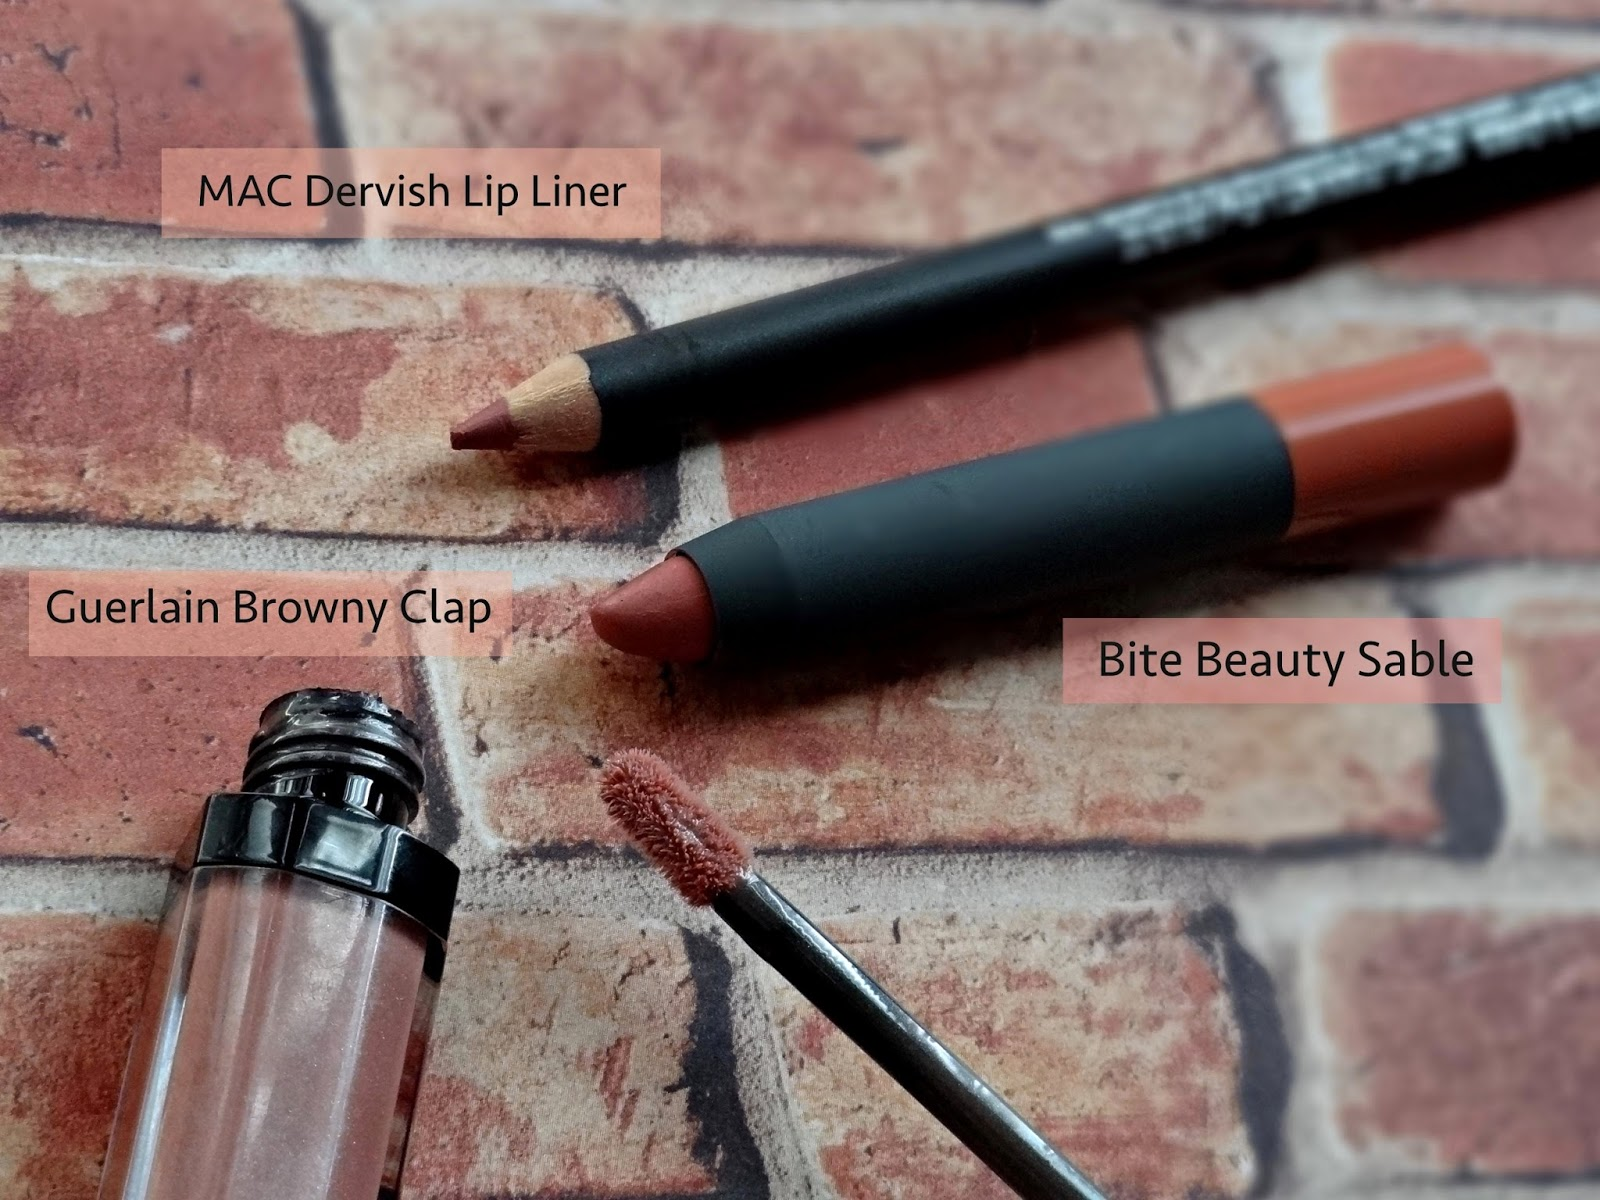 Nude Lips for Medium Dark Skintones - MAC Dervish Lip Liner, Bite Beauty Sable, Guerlain Maxi Shine Lip Gloss in Browny Clap